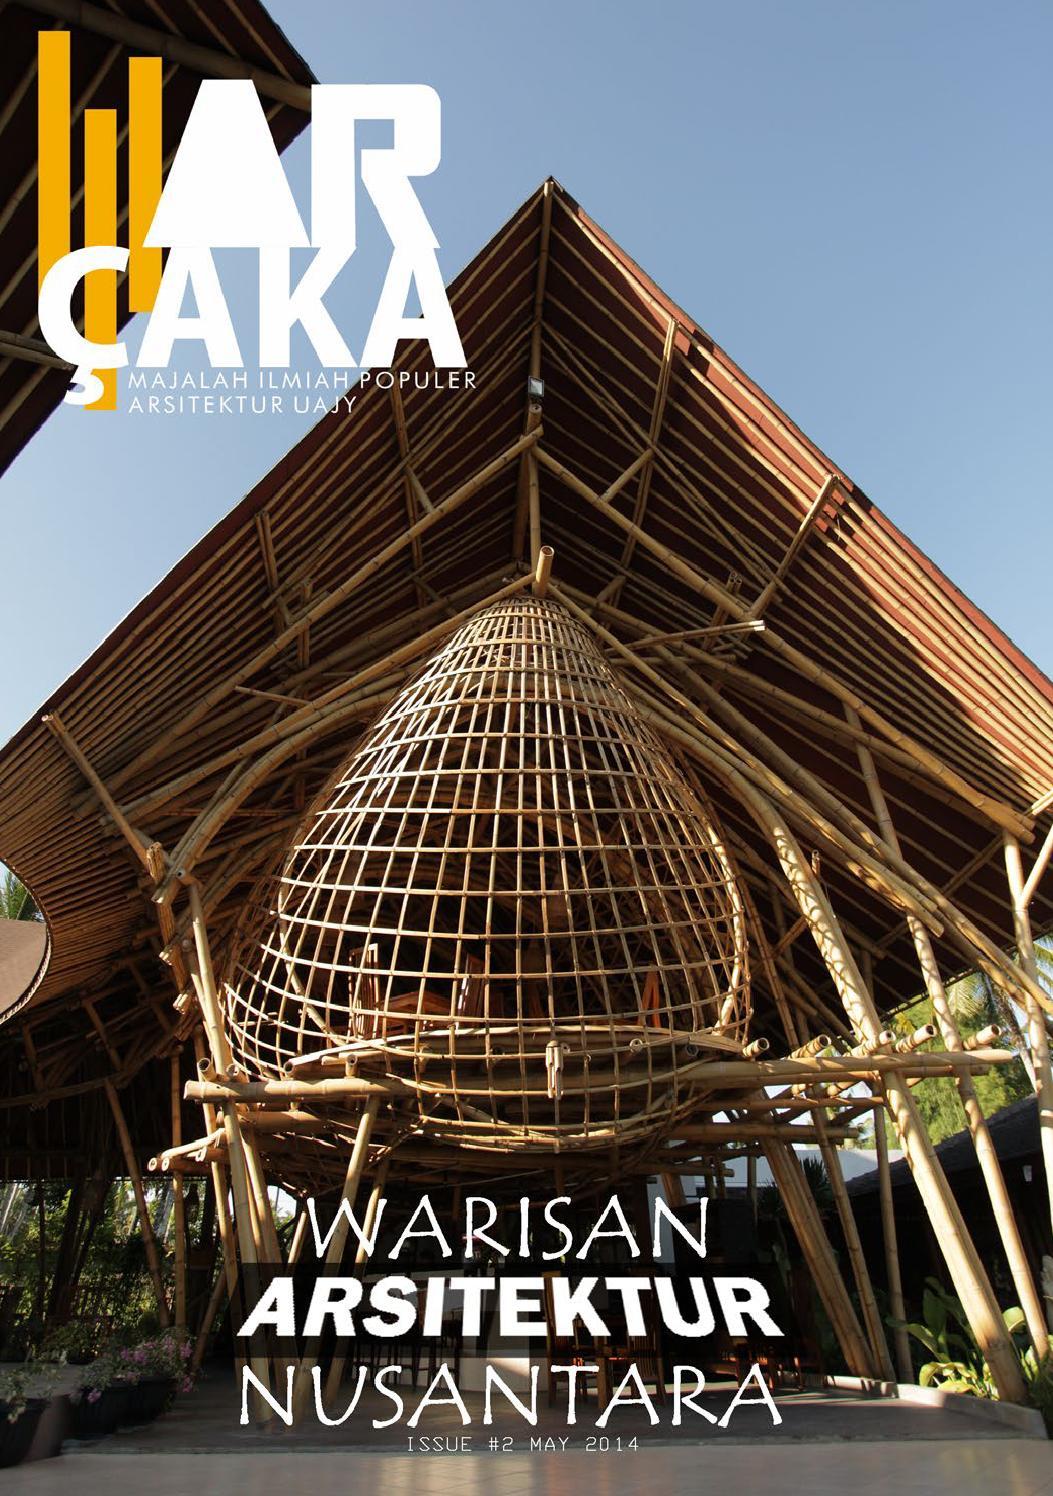 Issue 2 Warisan Arsiektur Nusantara By AR‡AKA Issuu